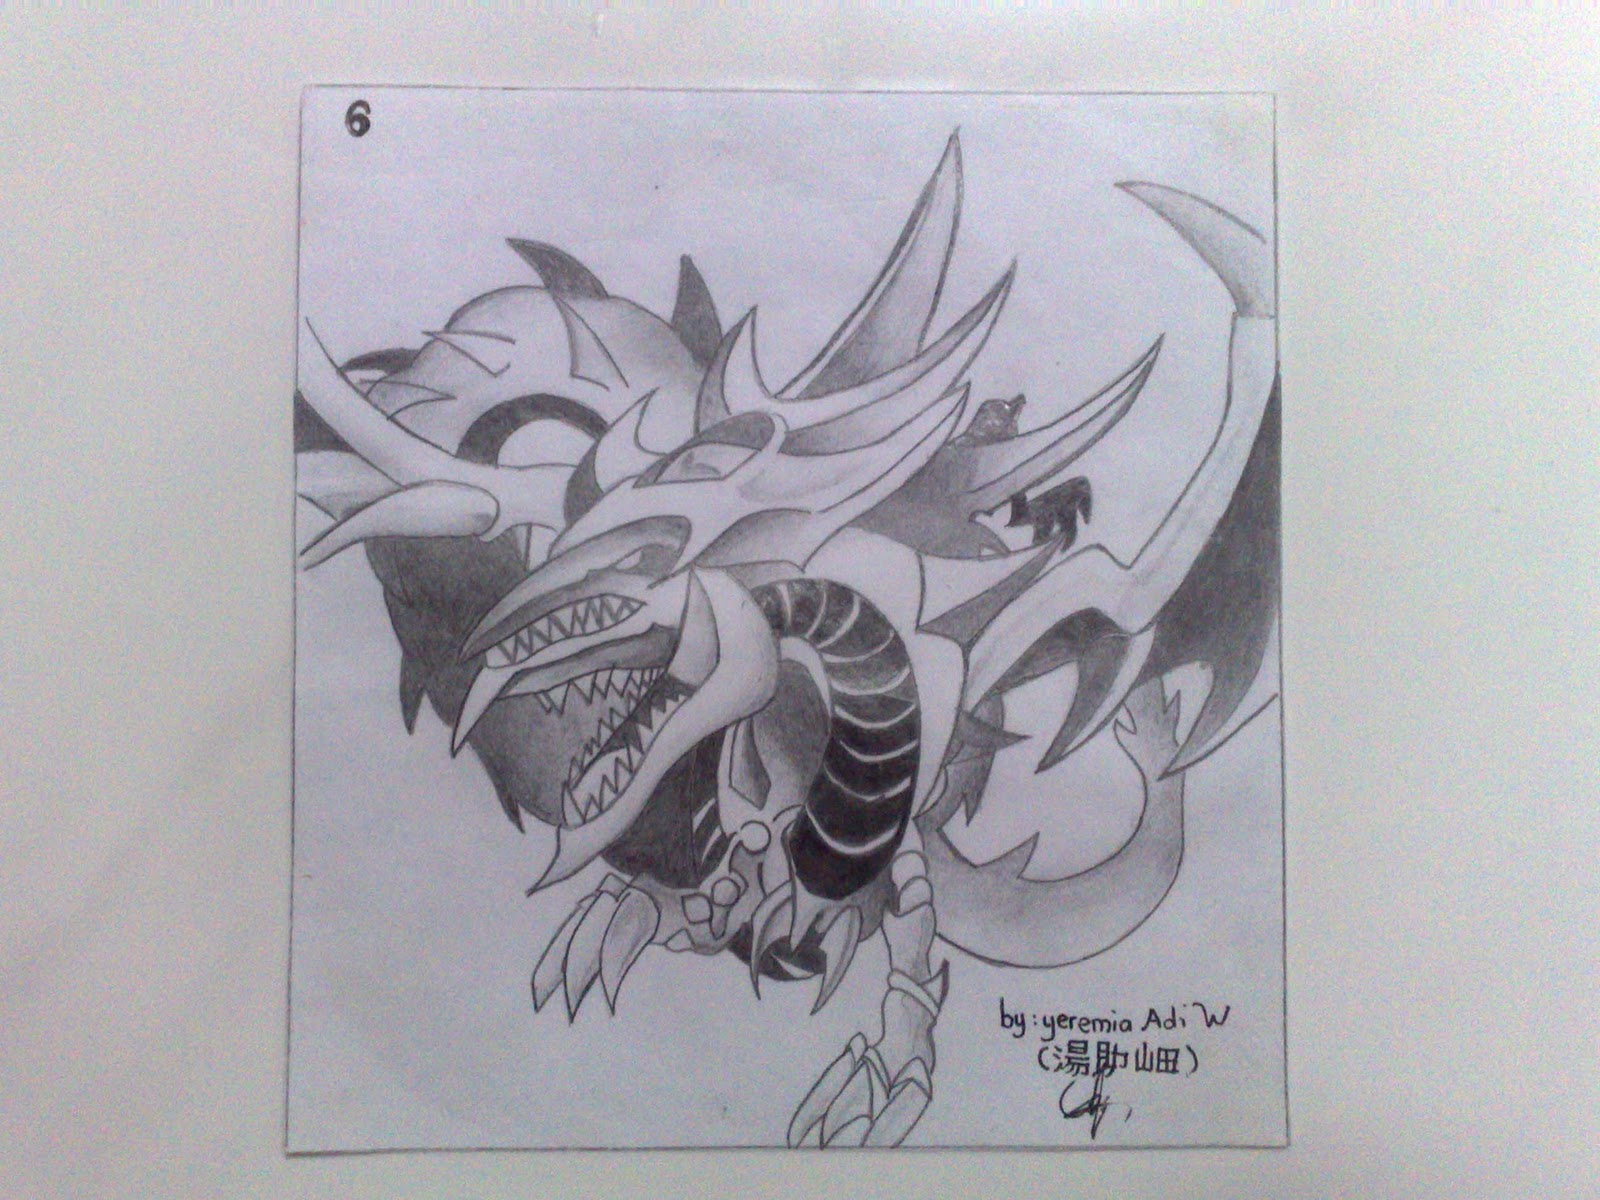 http://2.bp.blogspot.com/_MbdDljO-V-A/TVE2kelU_0I/AAAAAAAAAW4/mHMnBujLspM/s1600/Sliver+the+sky+dragon.jpg